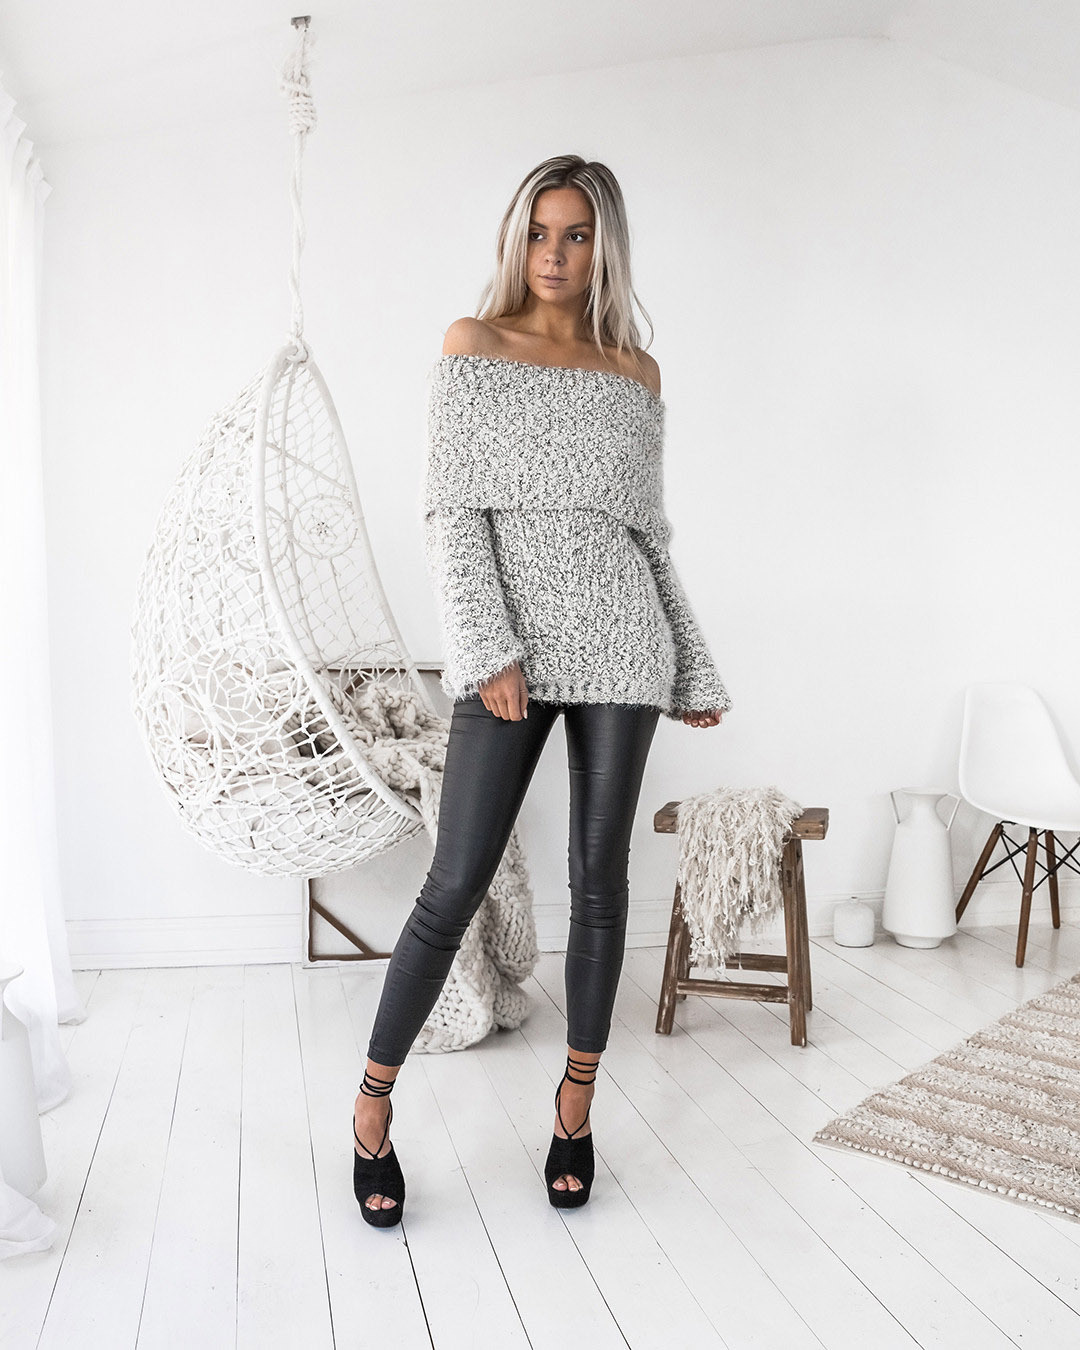 2018 Autumn Winter Slim Top Fashion Elegant Women Clothing Casual Christmas Long Sleeve Ruffles Slash Neck Knitted Sweaters